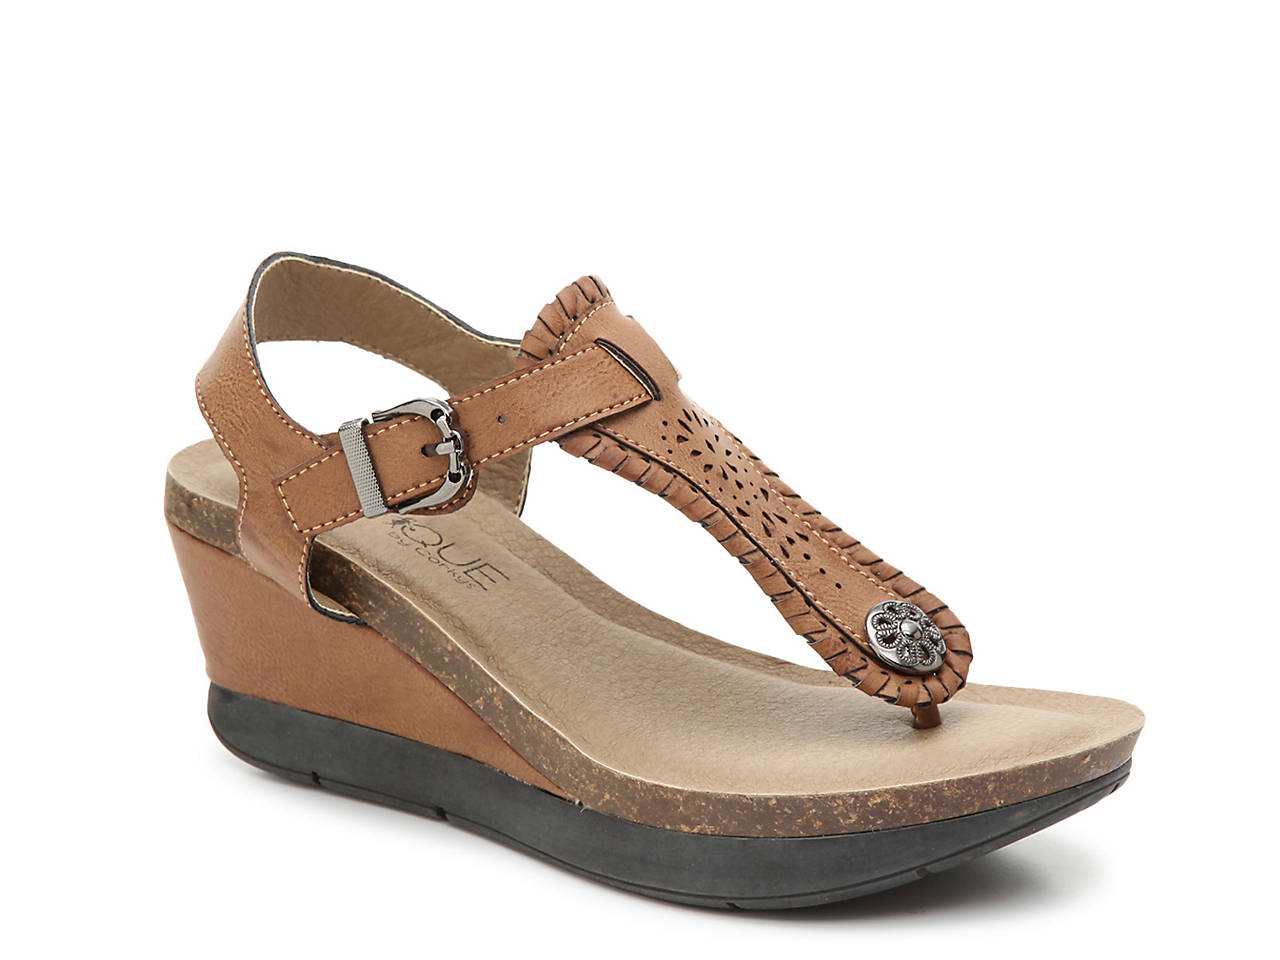 6aabc25b6a9 Corkys Knock Down Wedge Sandal Women s Shoes